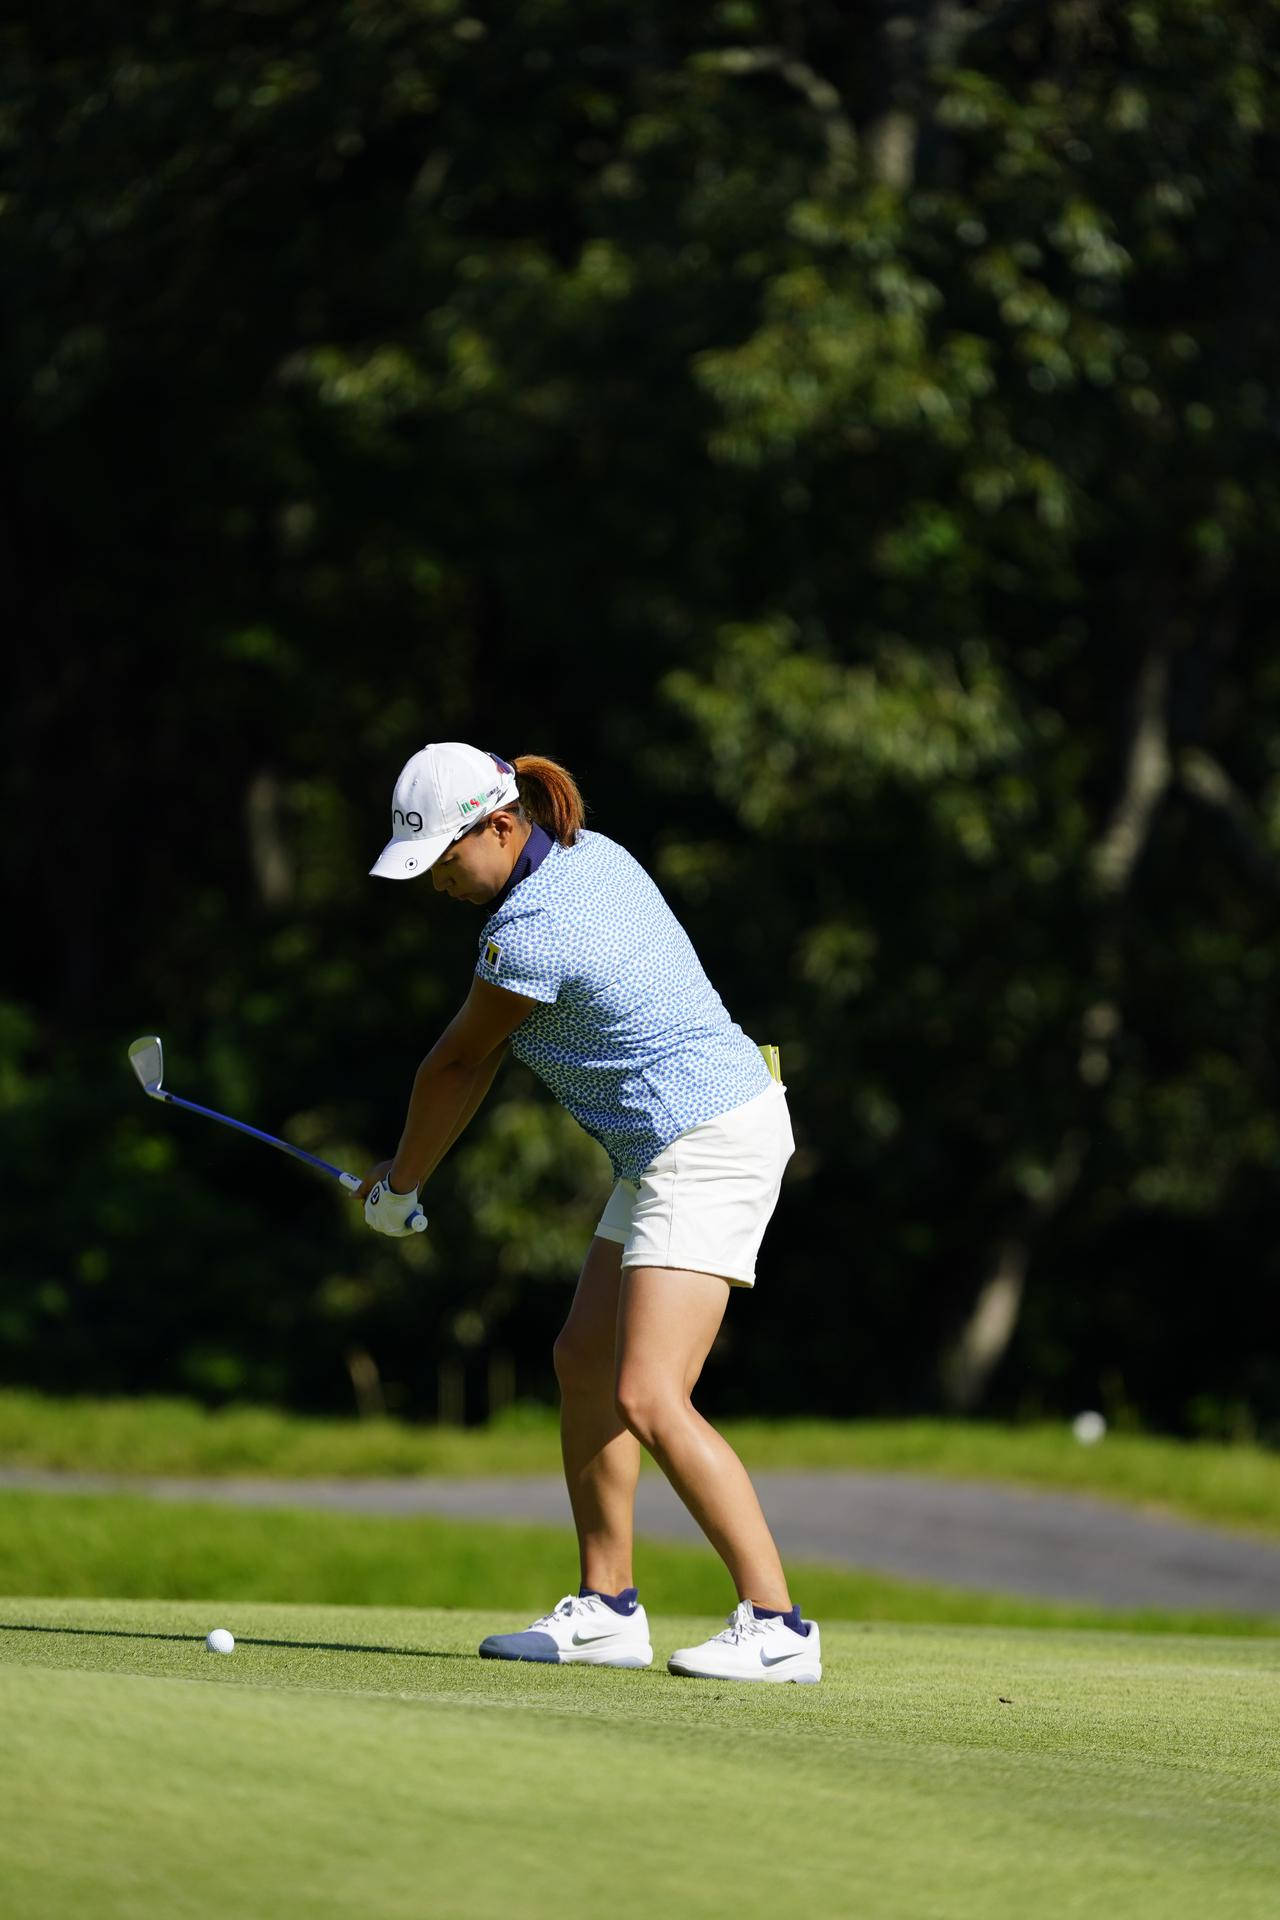 Images : 3番目の画像 - 渋野日向子 アイアン連続写真 - みんなのゴルフダイジェスト